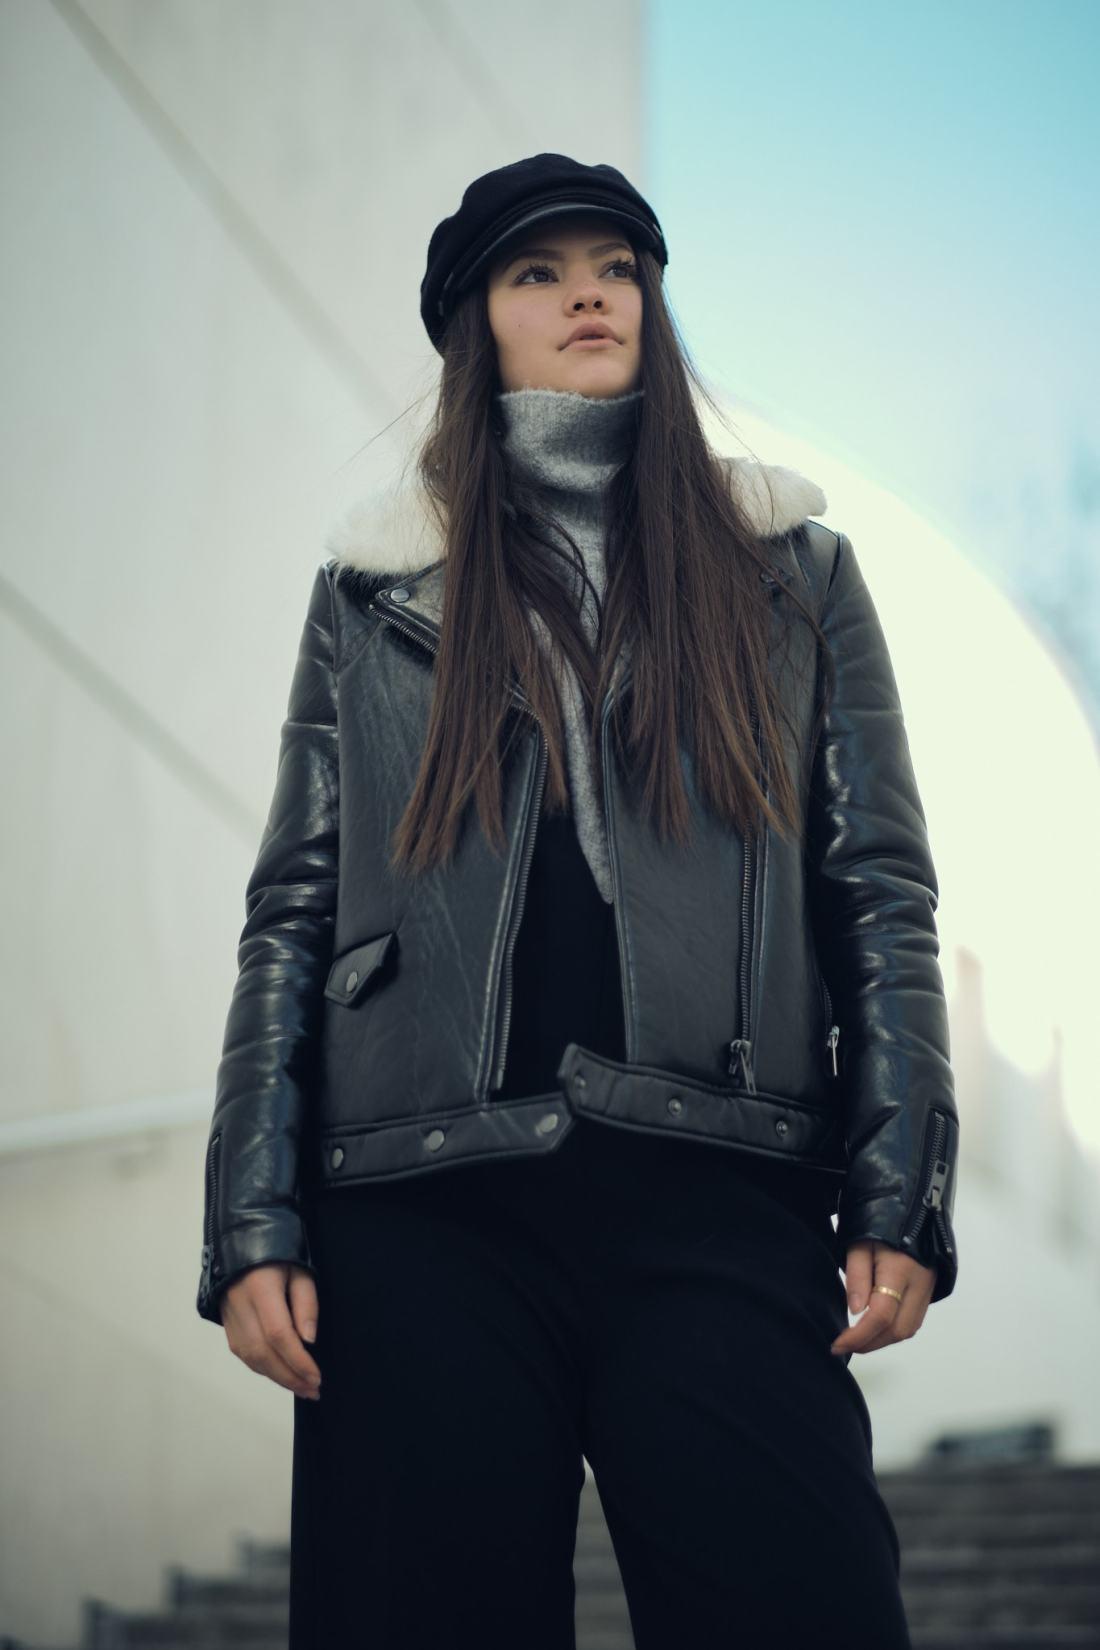 casquette-marin-fashion-blogger-blog-mode-paris-6-min